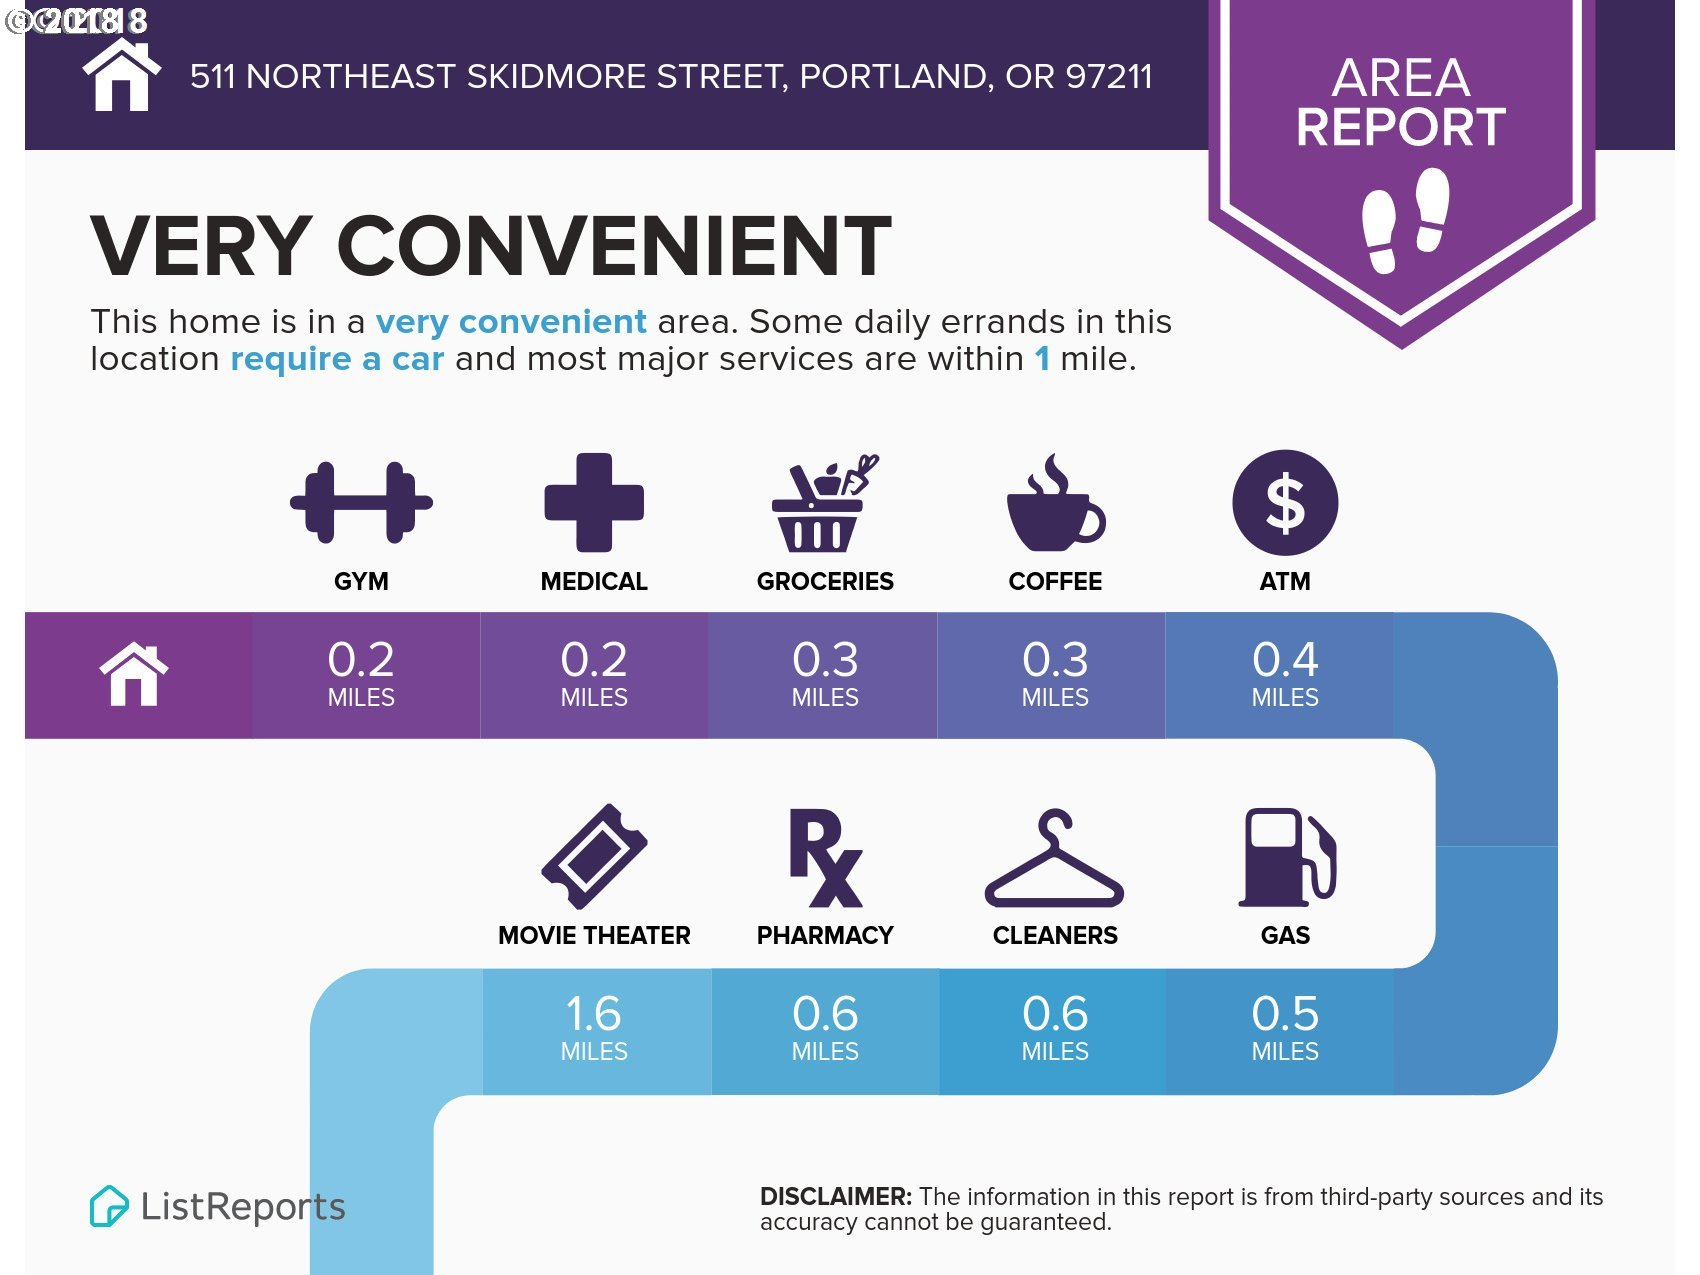 511 NE SKIDMORE ST Portland, OR 97211 - MLS #: 18232973